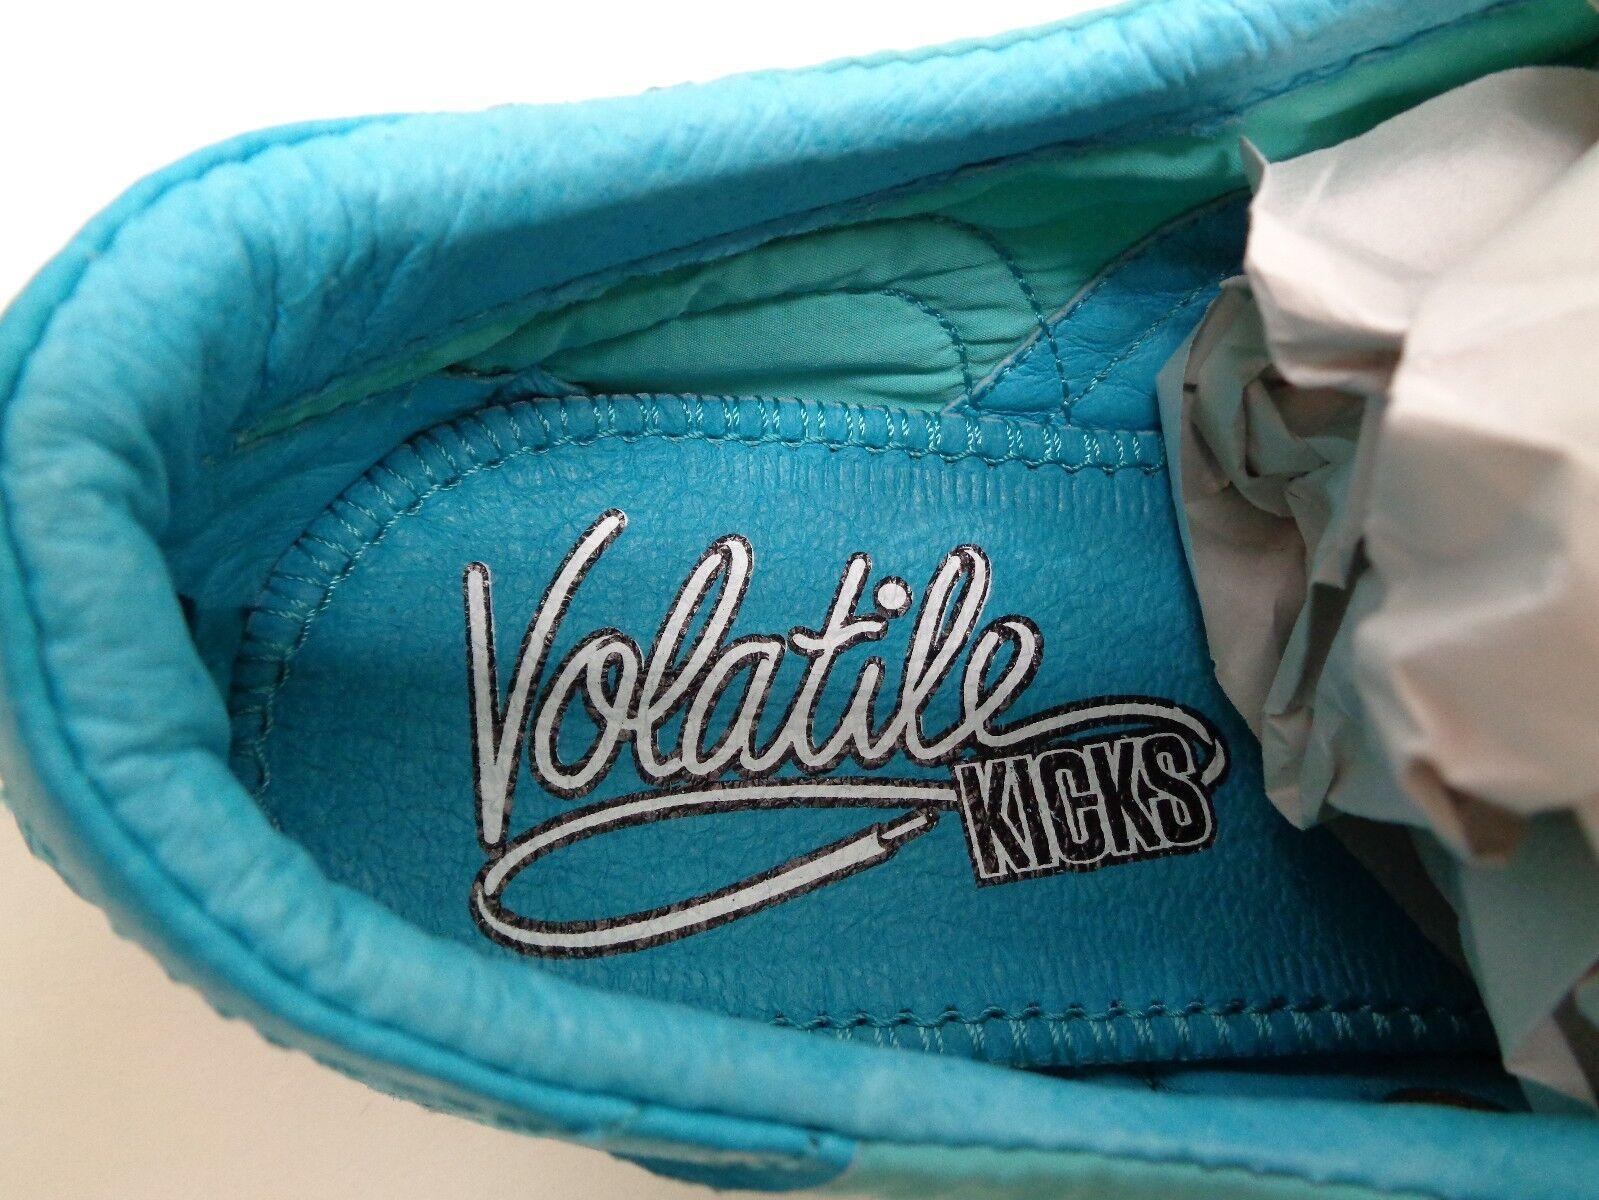 Volatile Kicks Größe 7 BANGIN Turquoise Leder Sneakers NEU Damenschuhe Schuhes